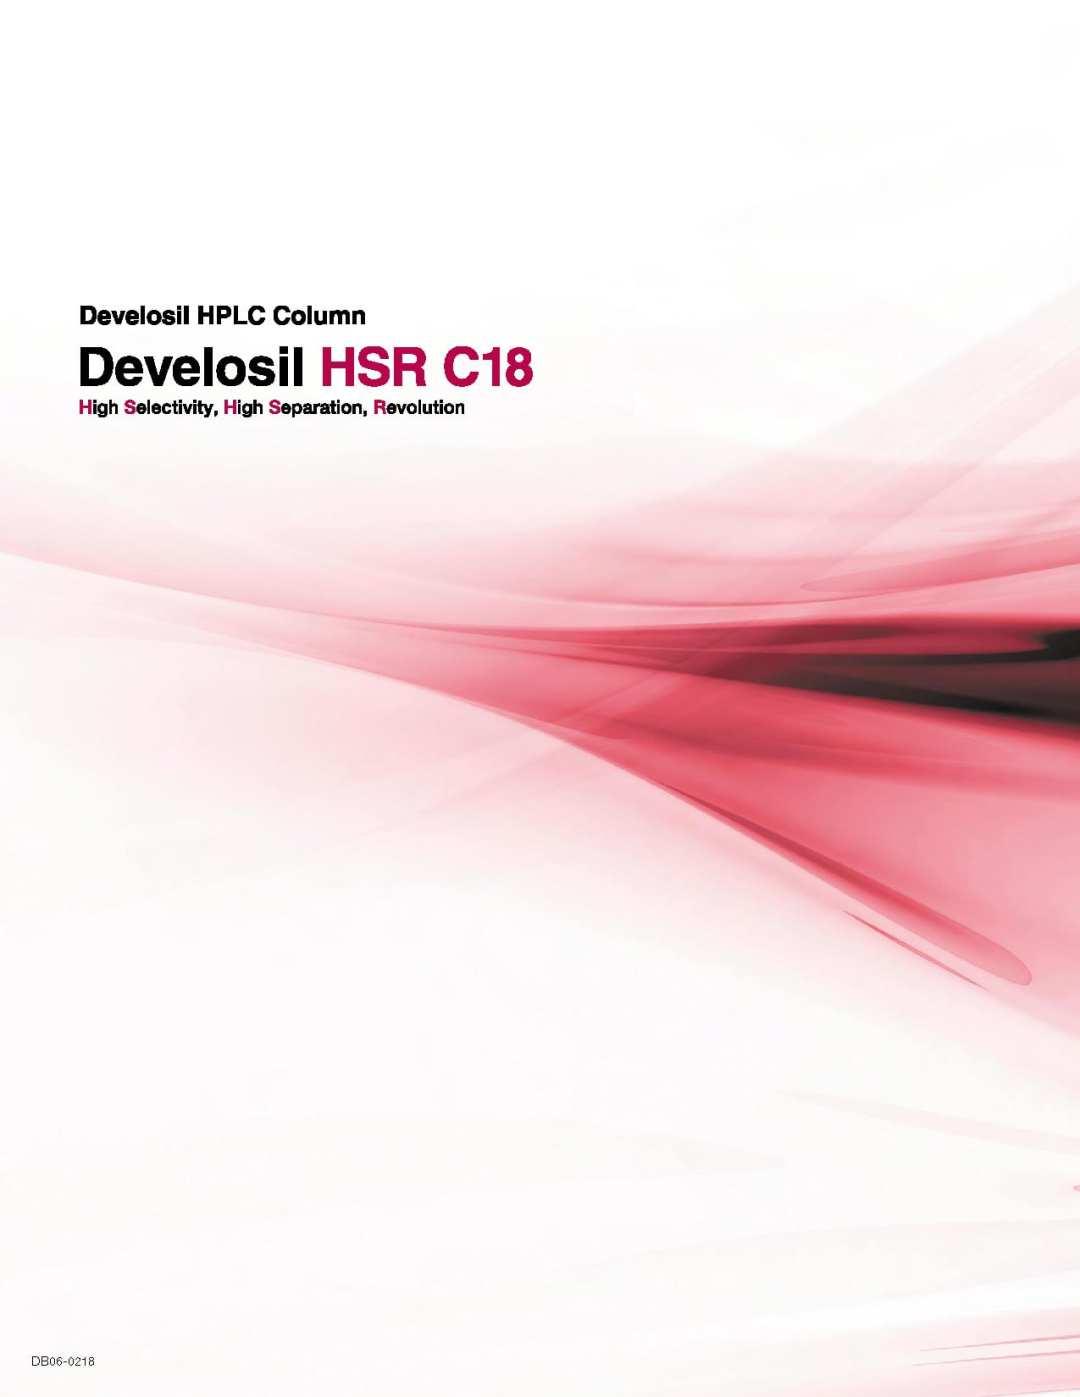 Develosil HSR C18 Product Brochure